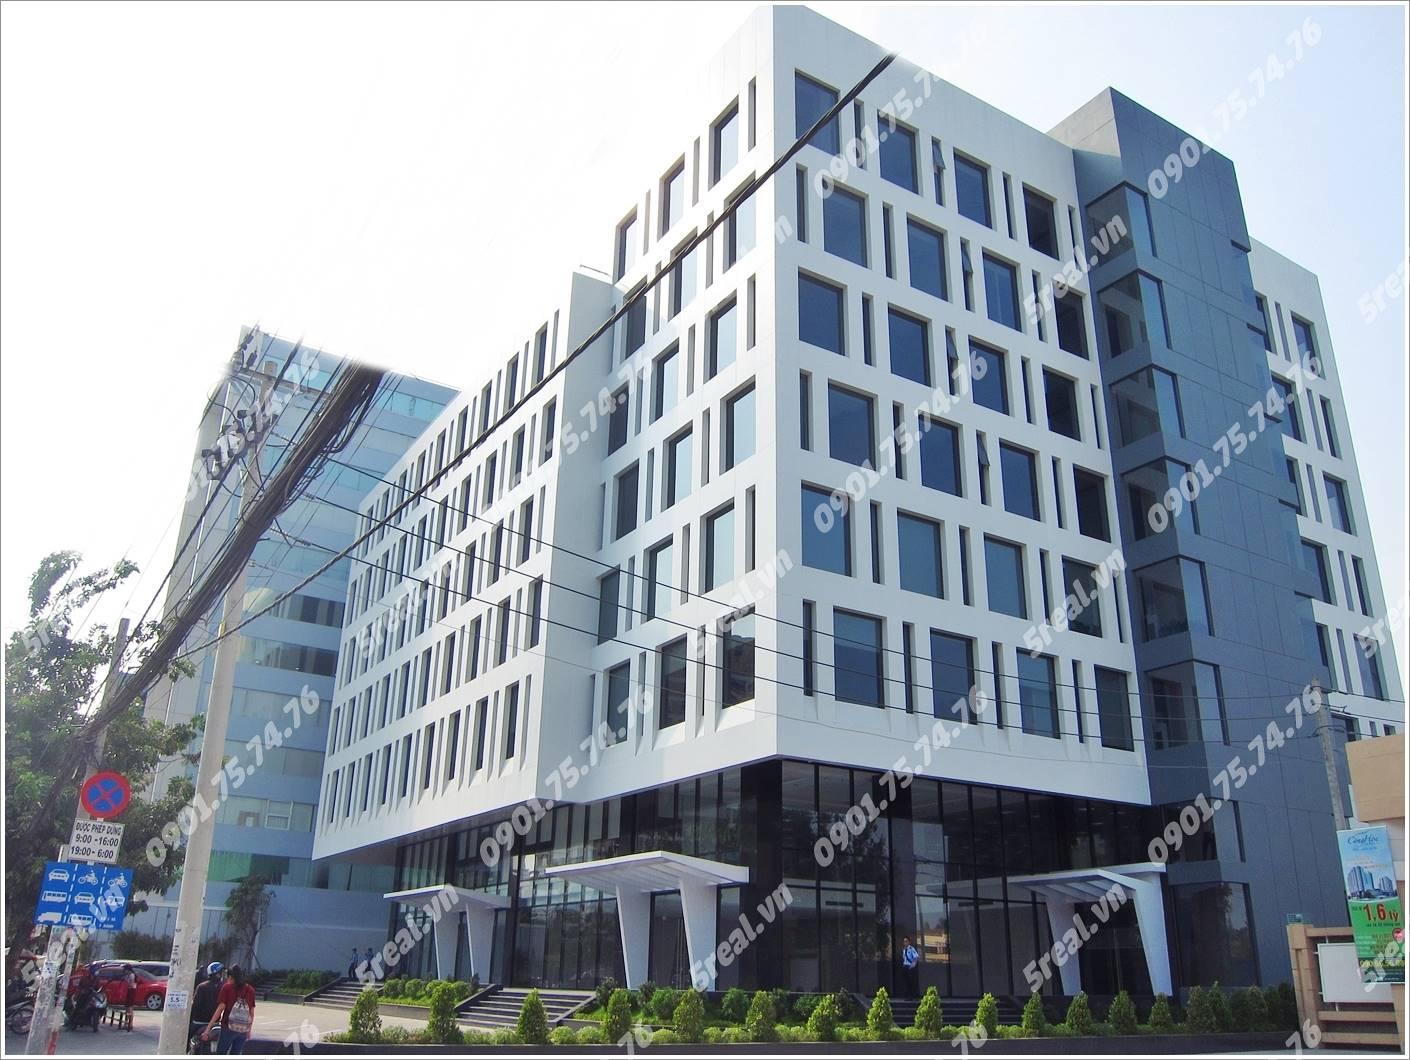 144-cong-hoa-building-quan-tan-binh-van-phong-cho-thue-5real.vn-01